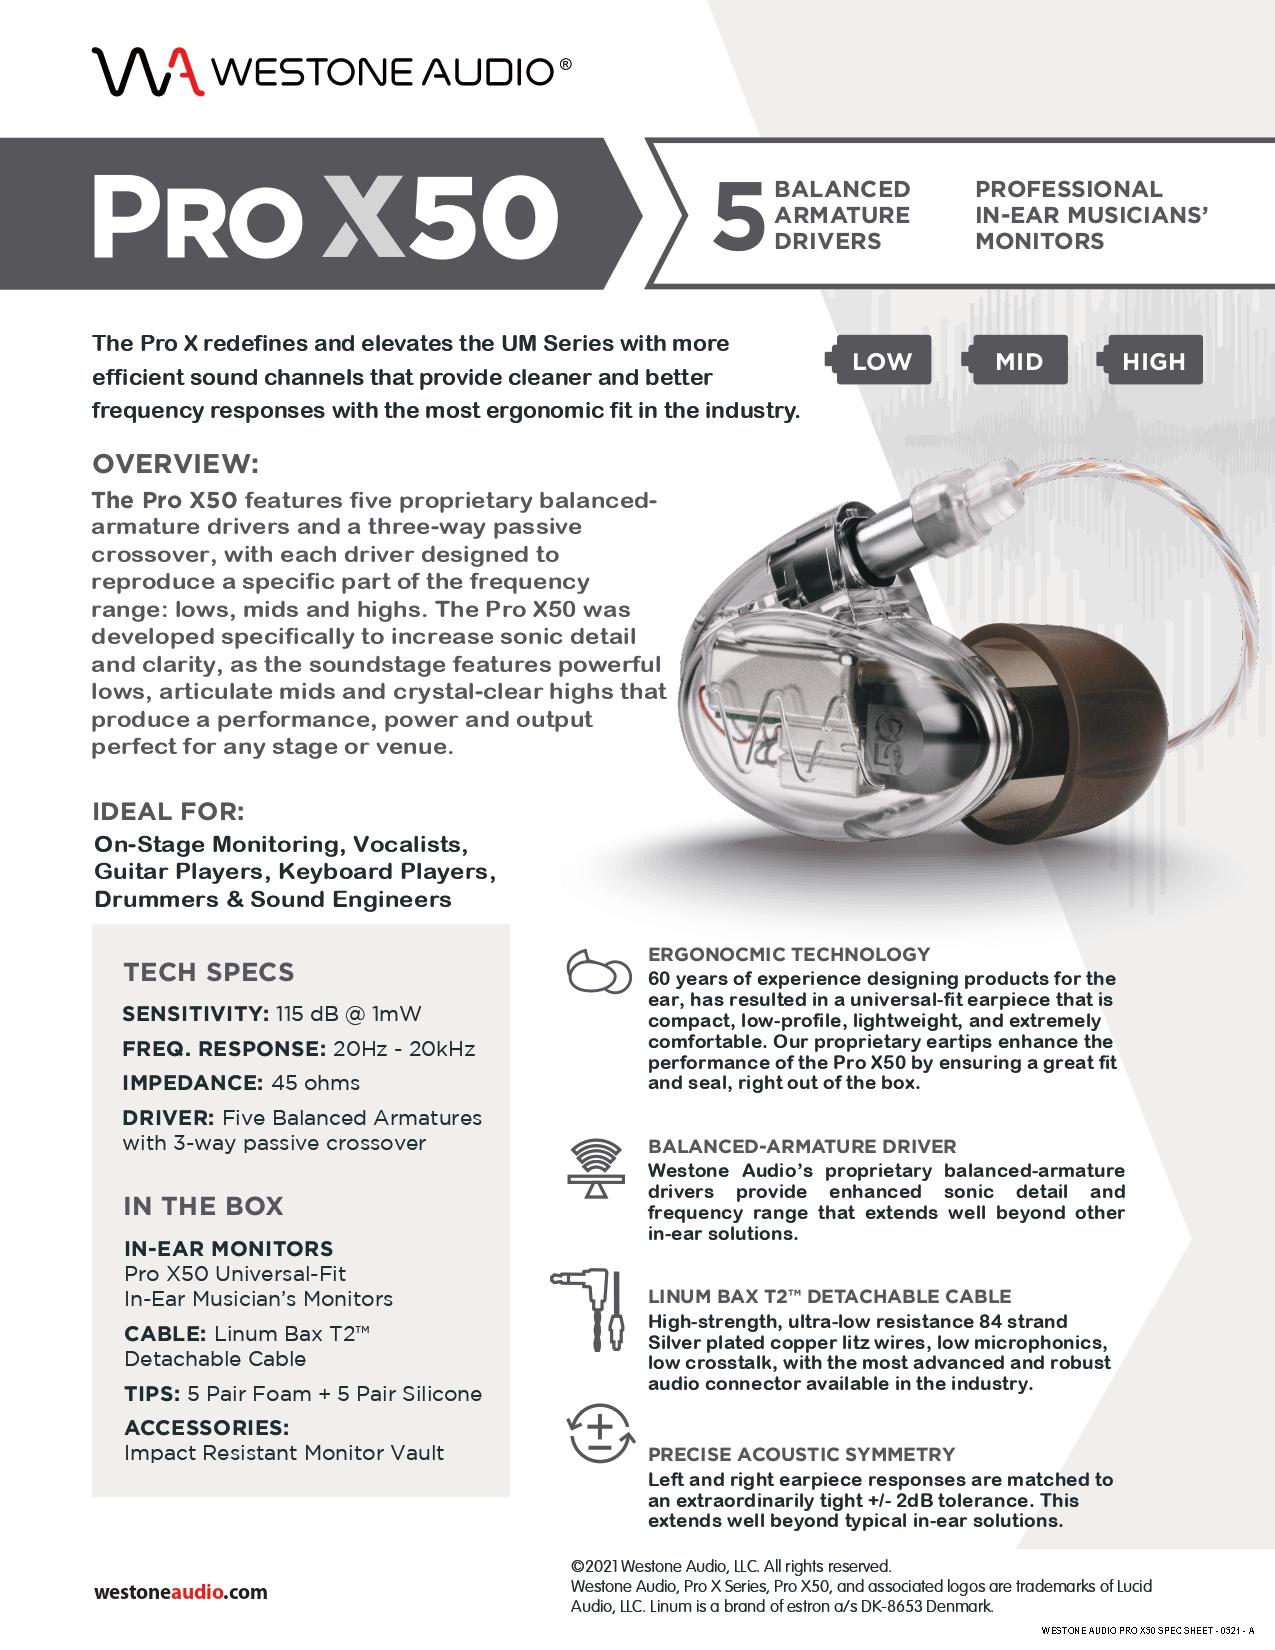 new-pro-x50-line-up-spec-sheet-page-0001.jpg